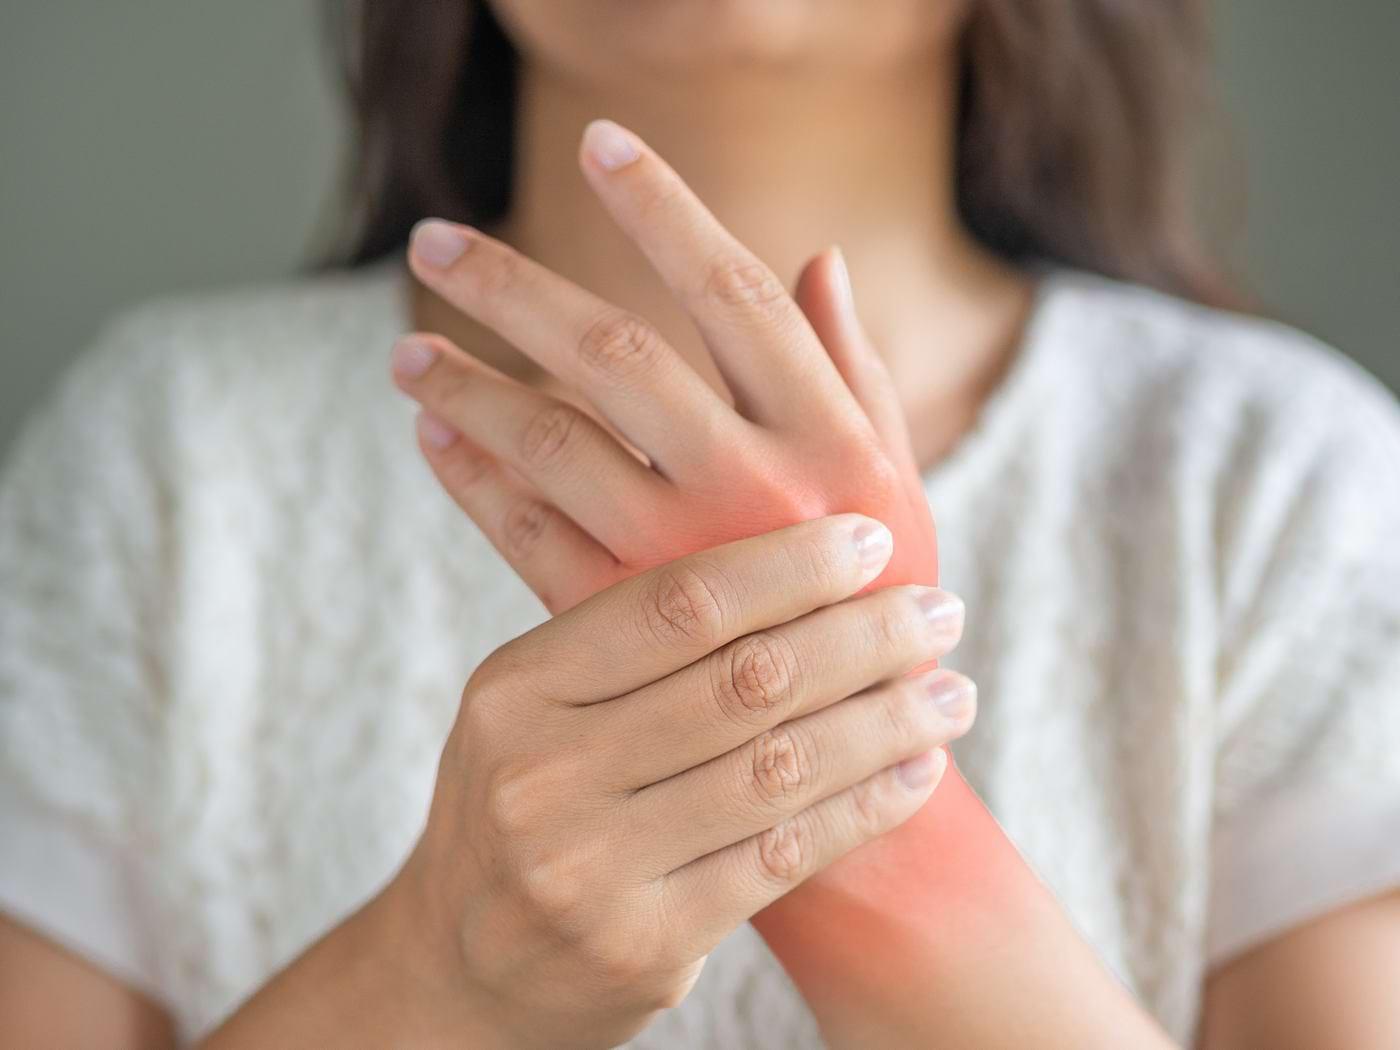 Se poate transmite artrita de la o generație la alta?